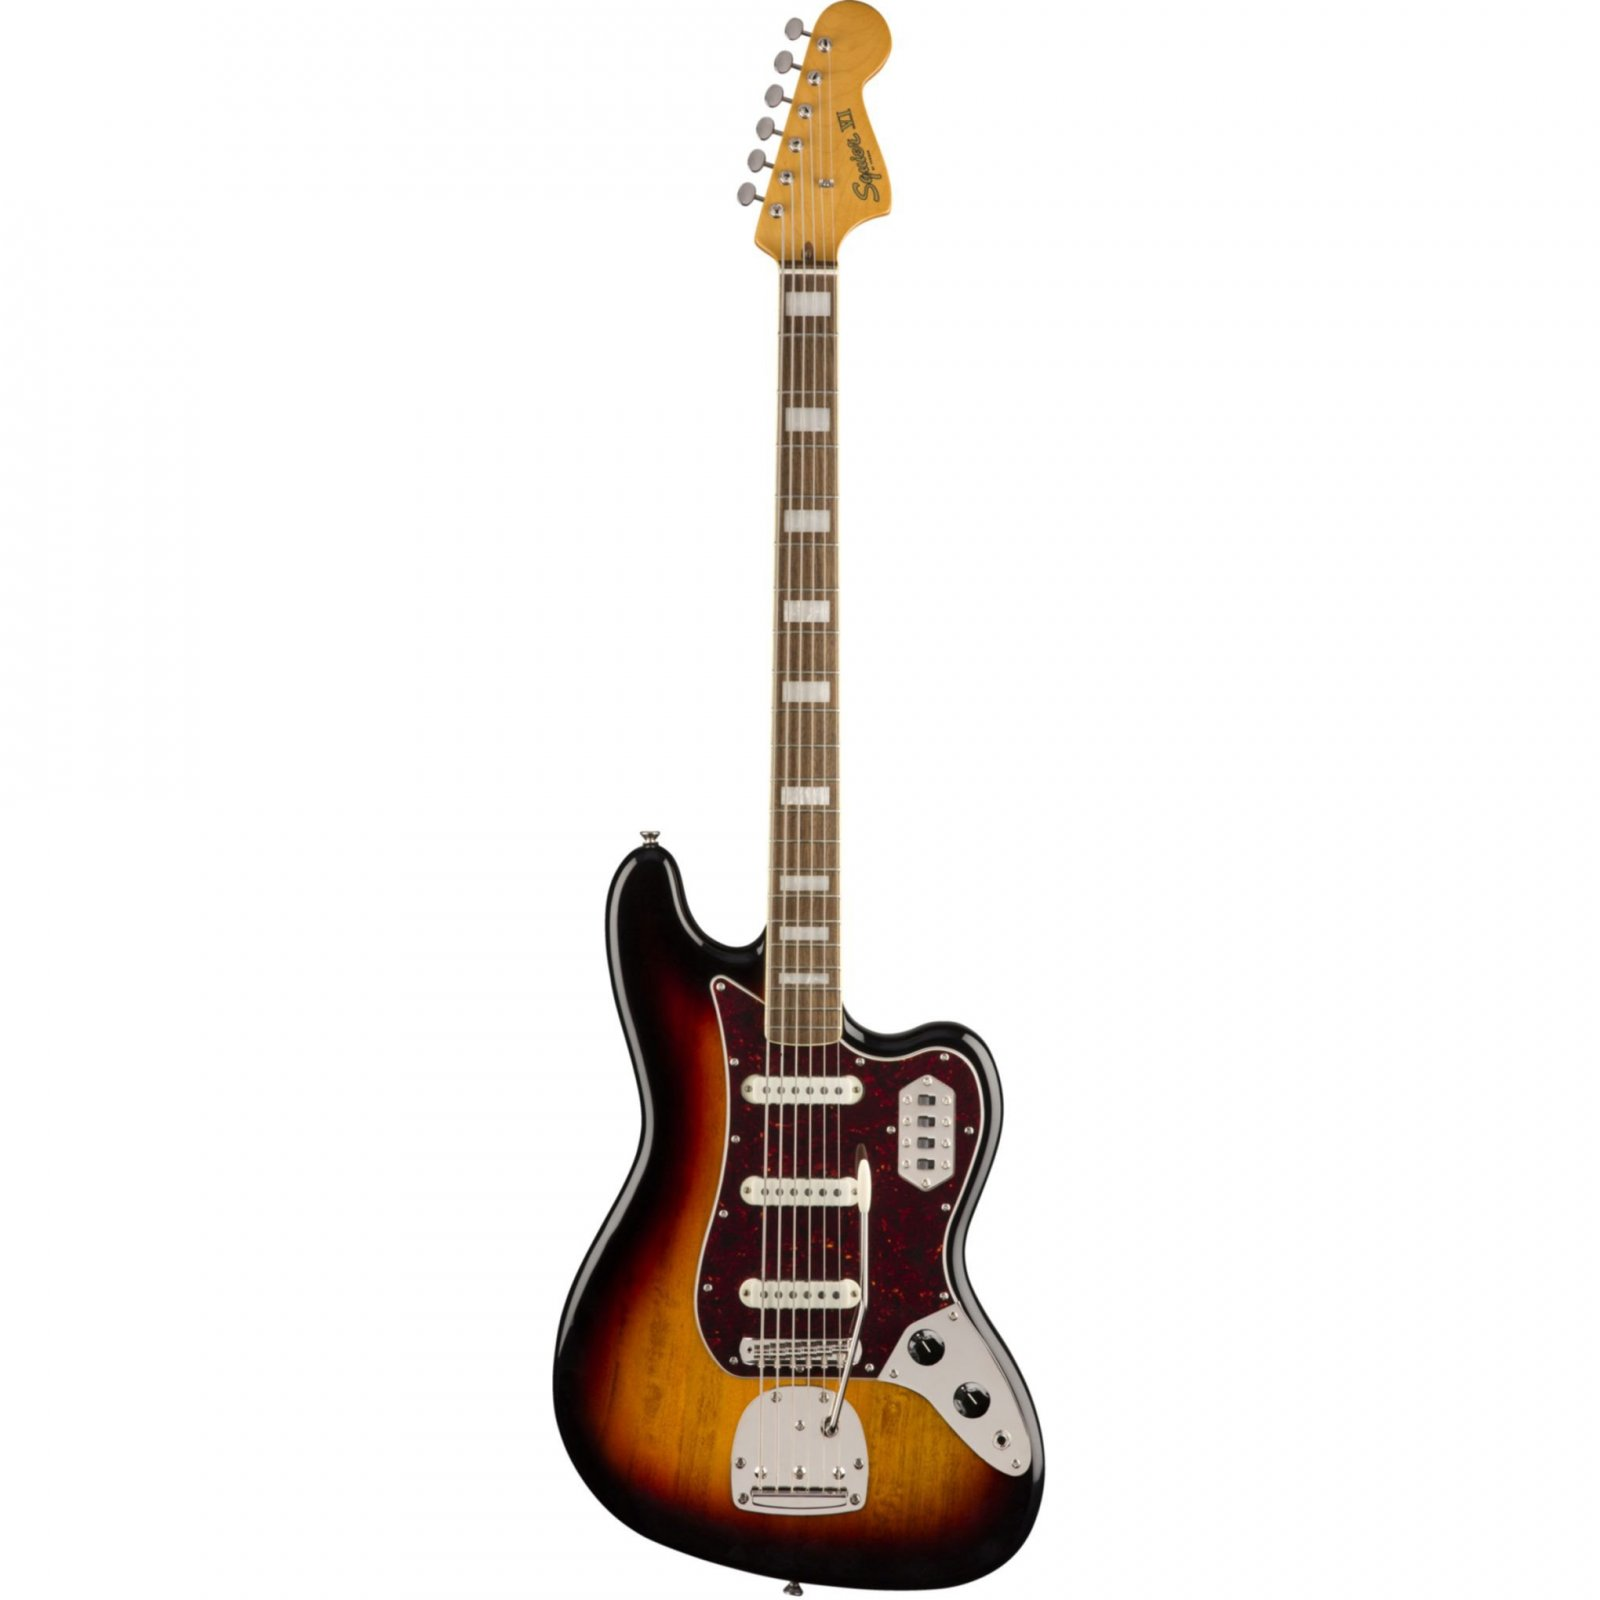 Squier Classic Vibe Bass VI 3 Color Sunburst